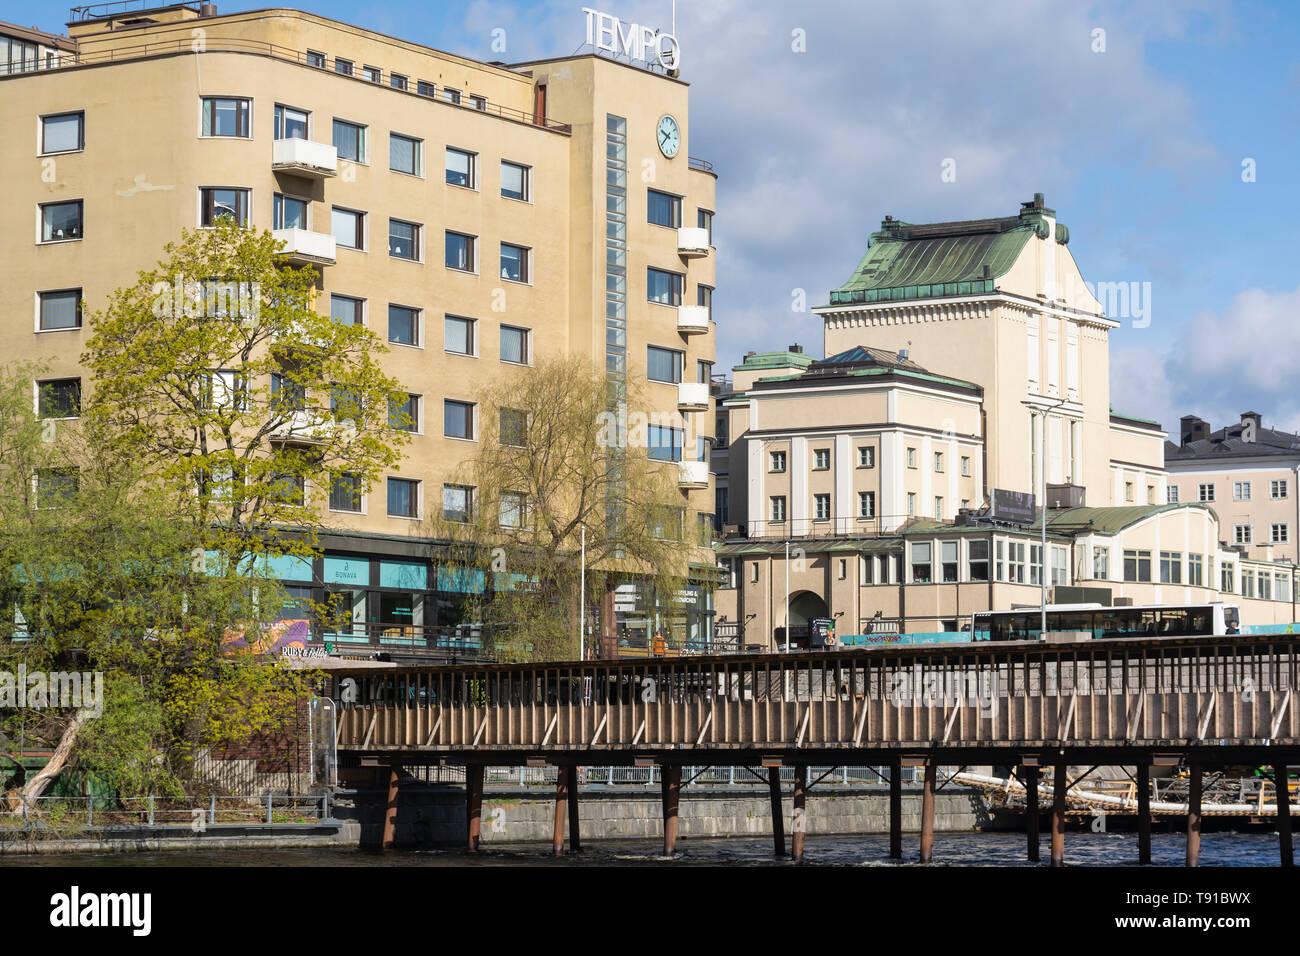 Wooden Bridge over Tammerkoski in Tampere Finland - Stock Image